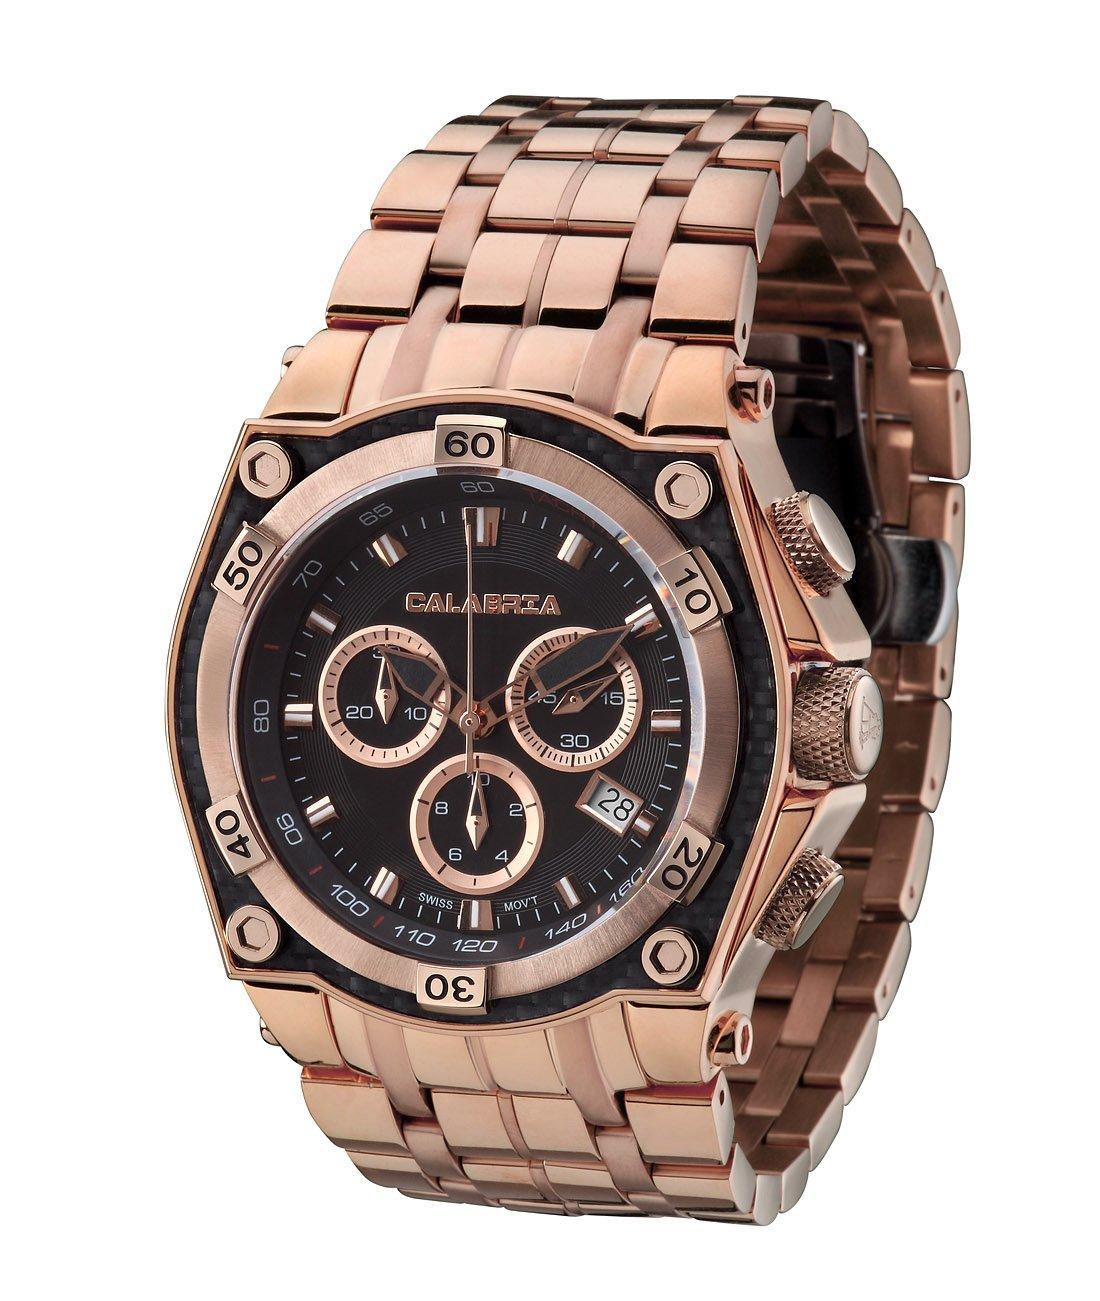 CALABRIA - MEZZANOTTE - Classic Rose Gold Chronograph Men's Watch with Carbon Fiber Bezel